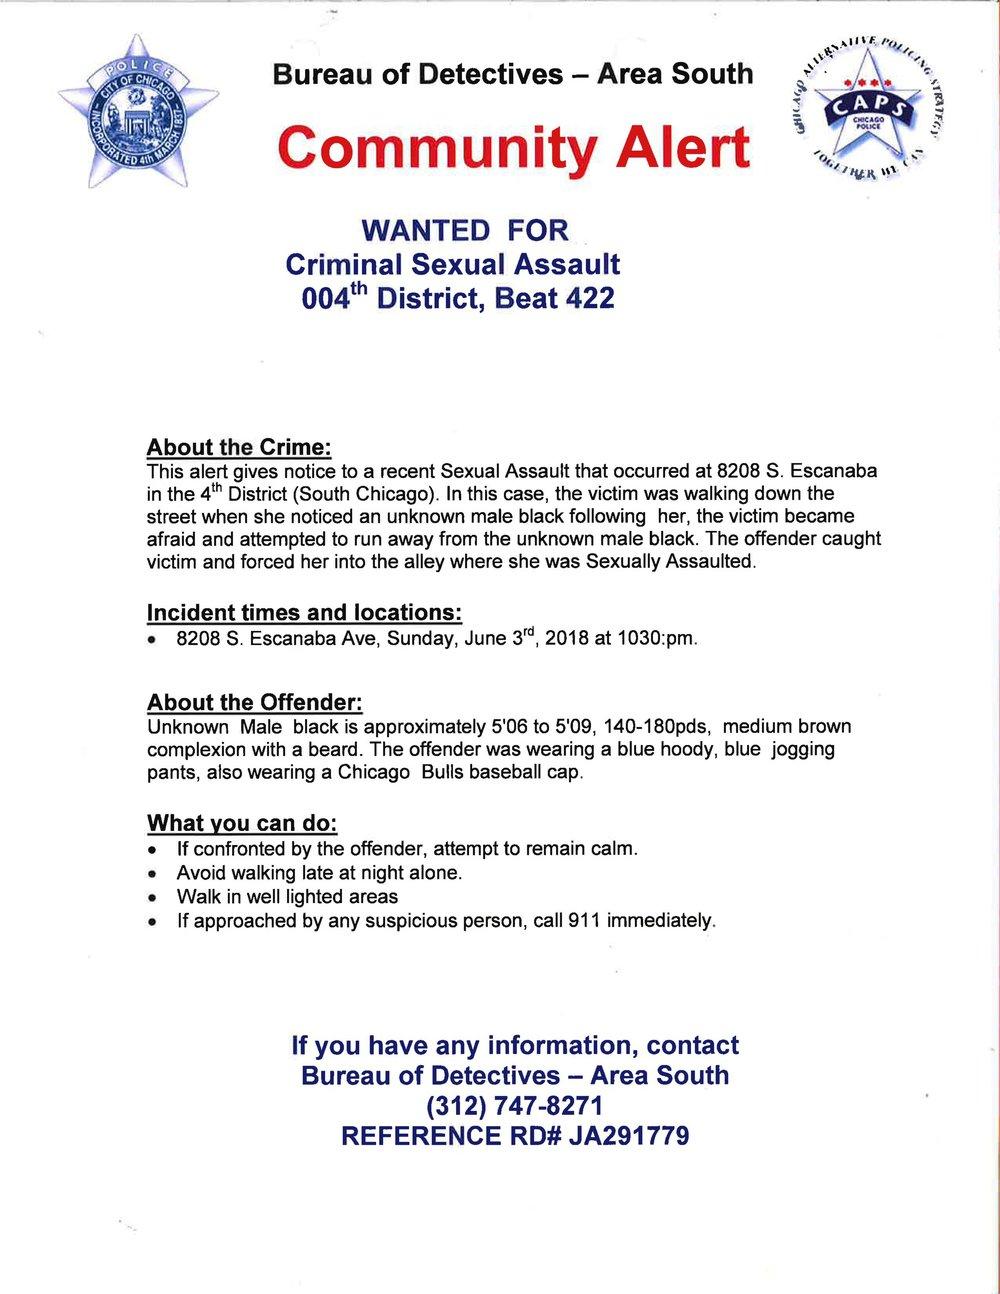 Community Alert 6.5.18.jpg